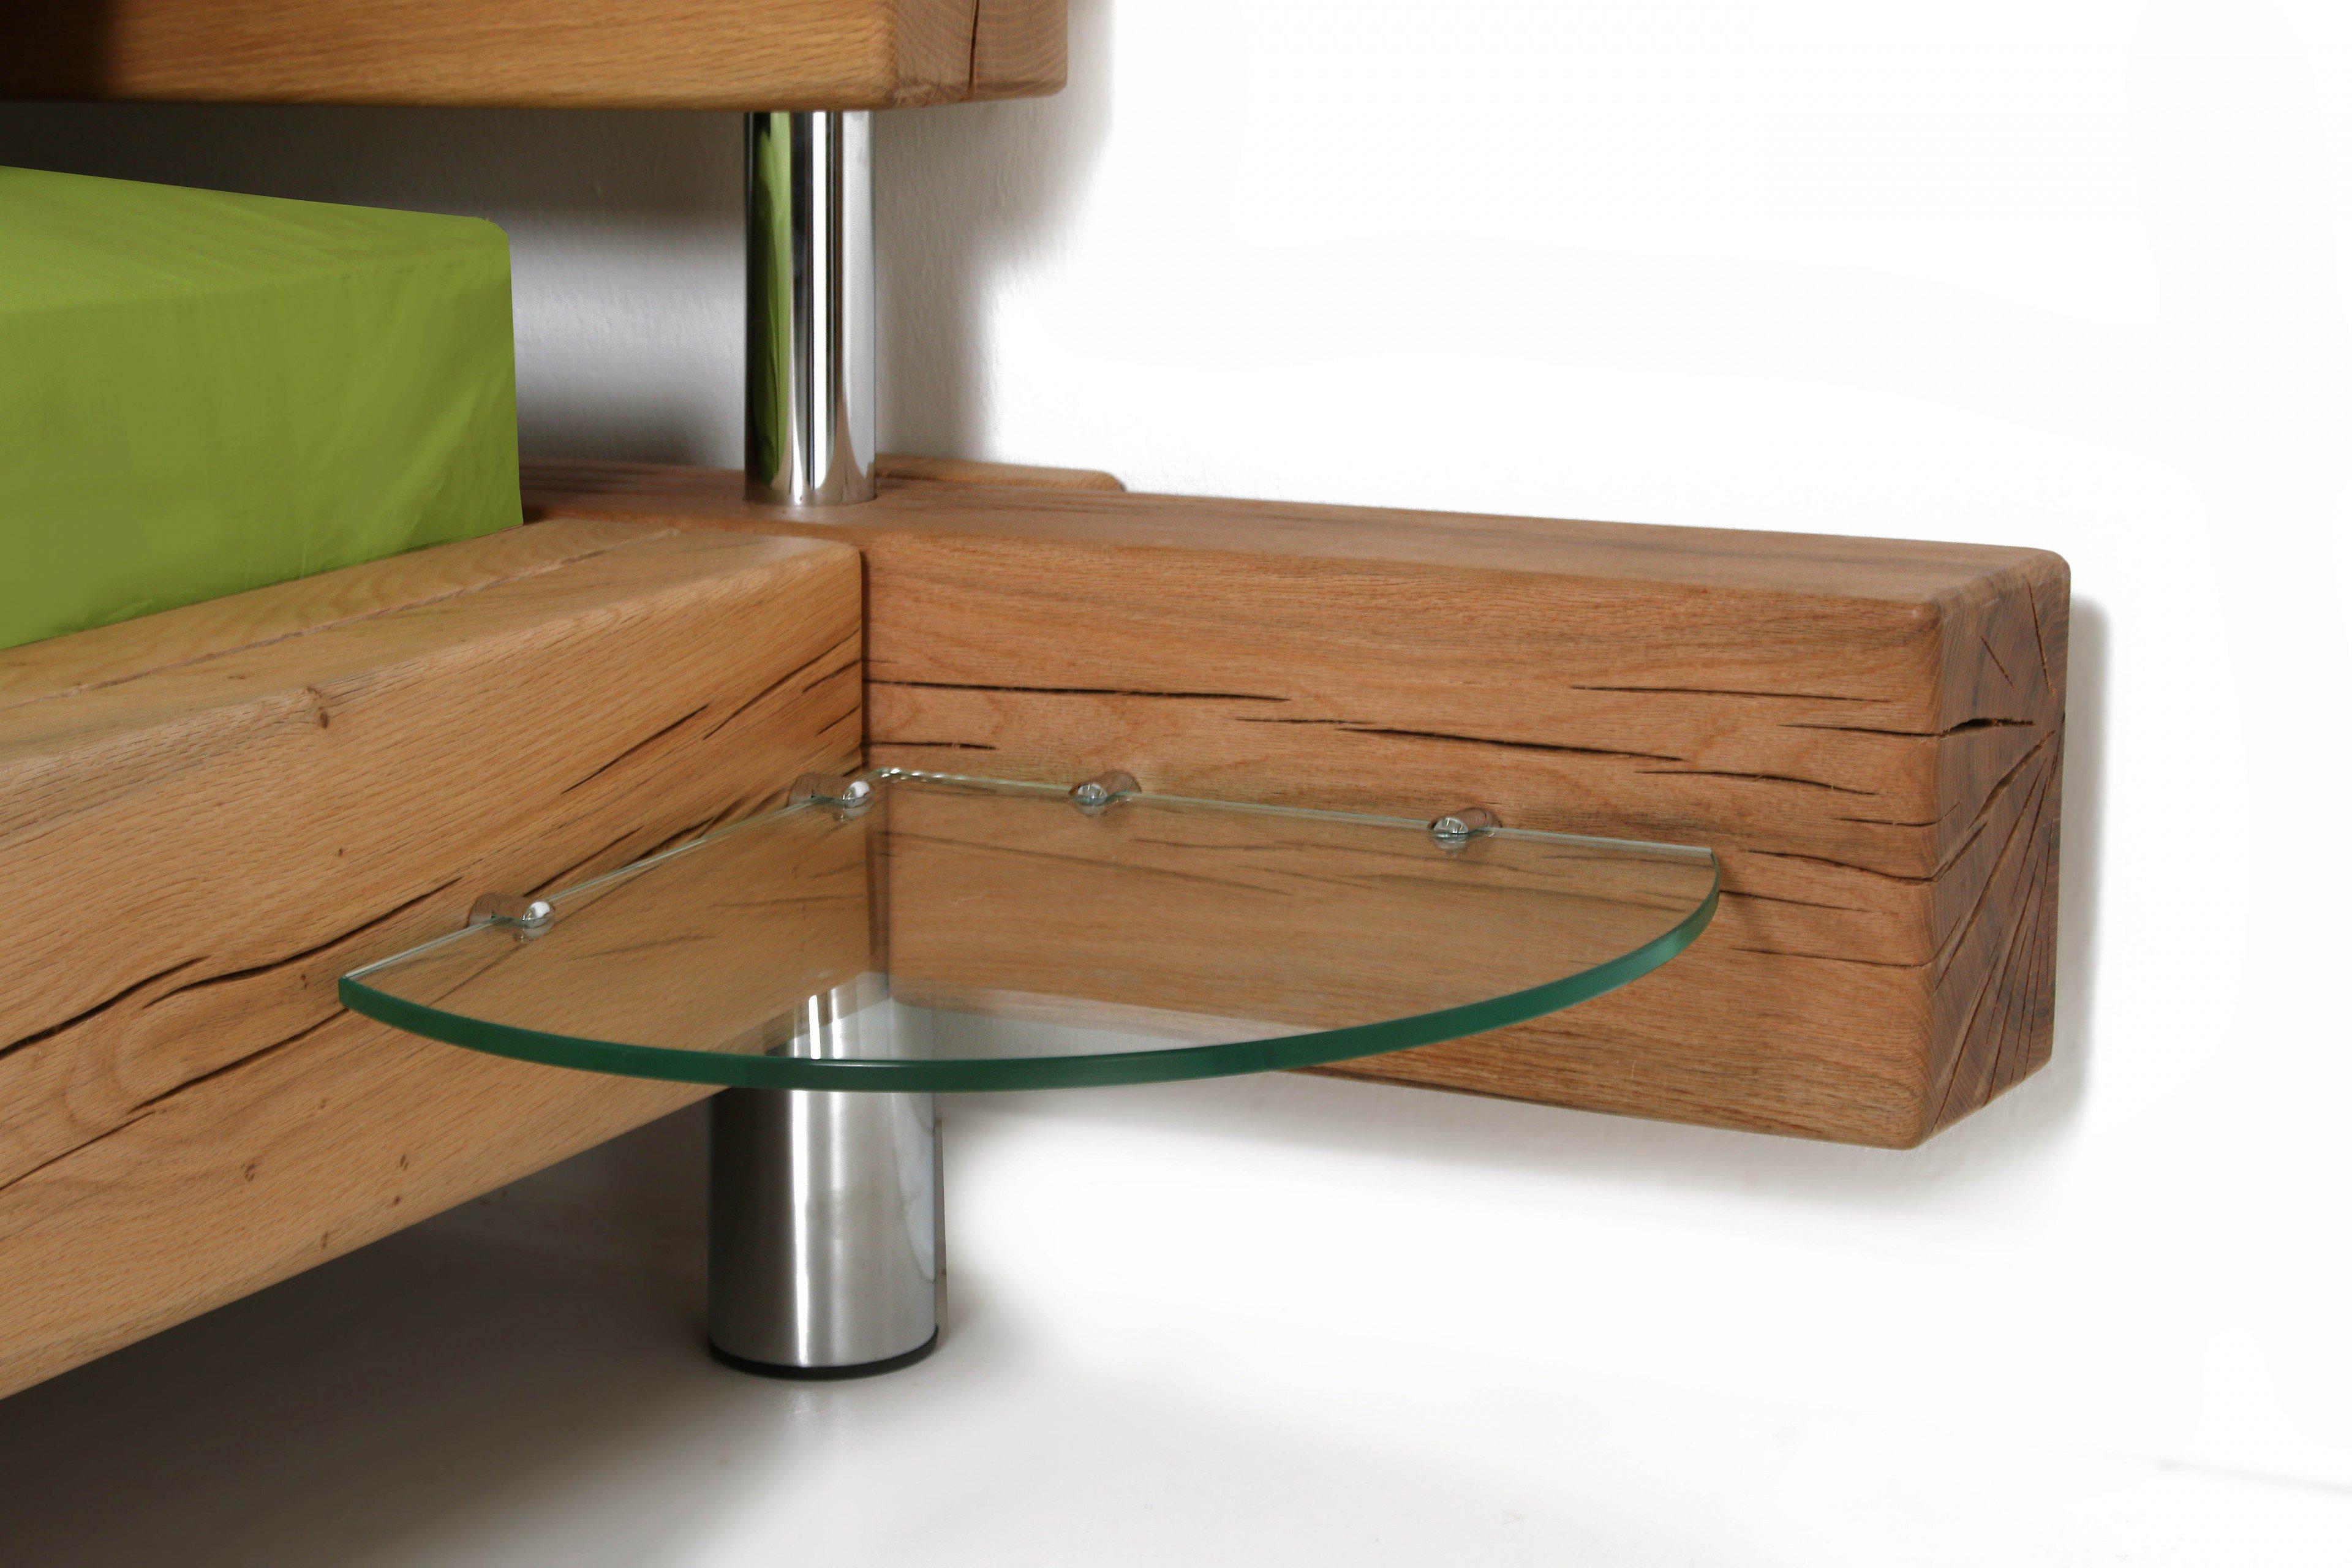 sprenger balken bett sumpfeiche geschliffen m bel letz. Black Bedroom Furniture Sets. Home Design Ideas